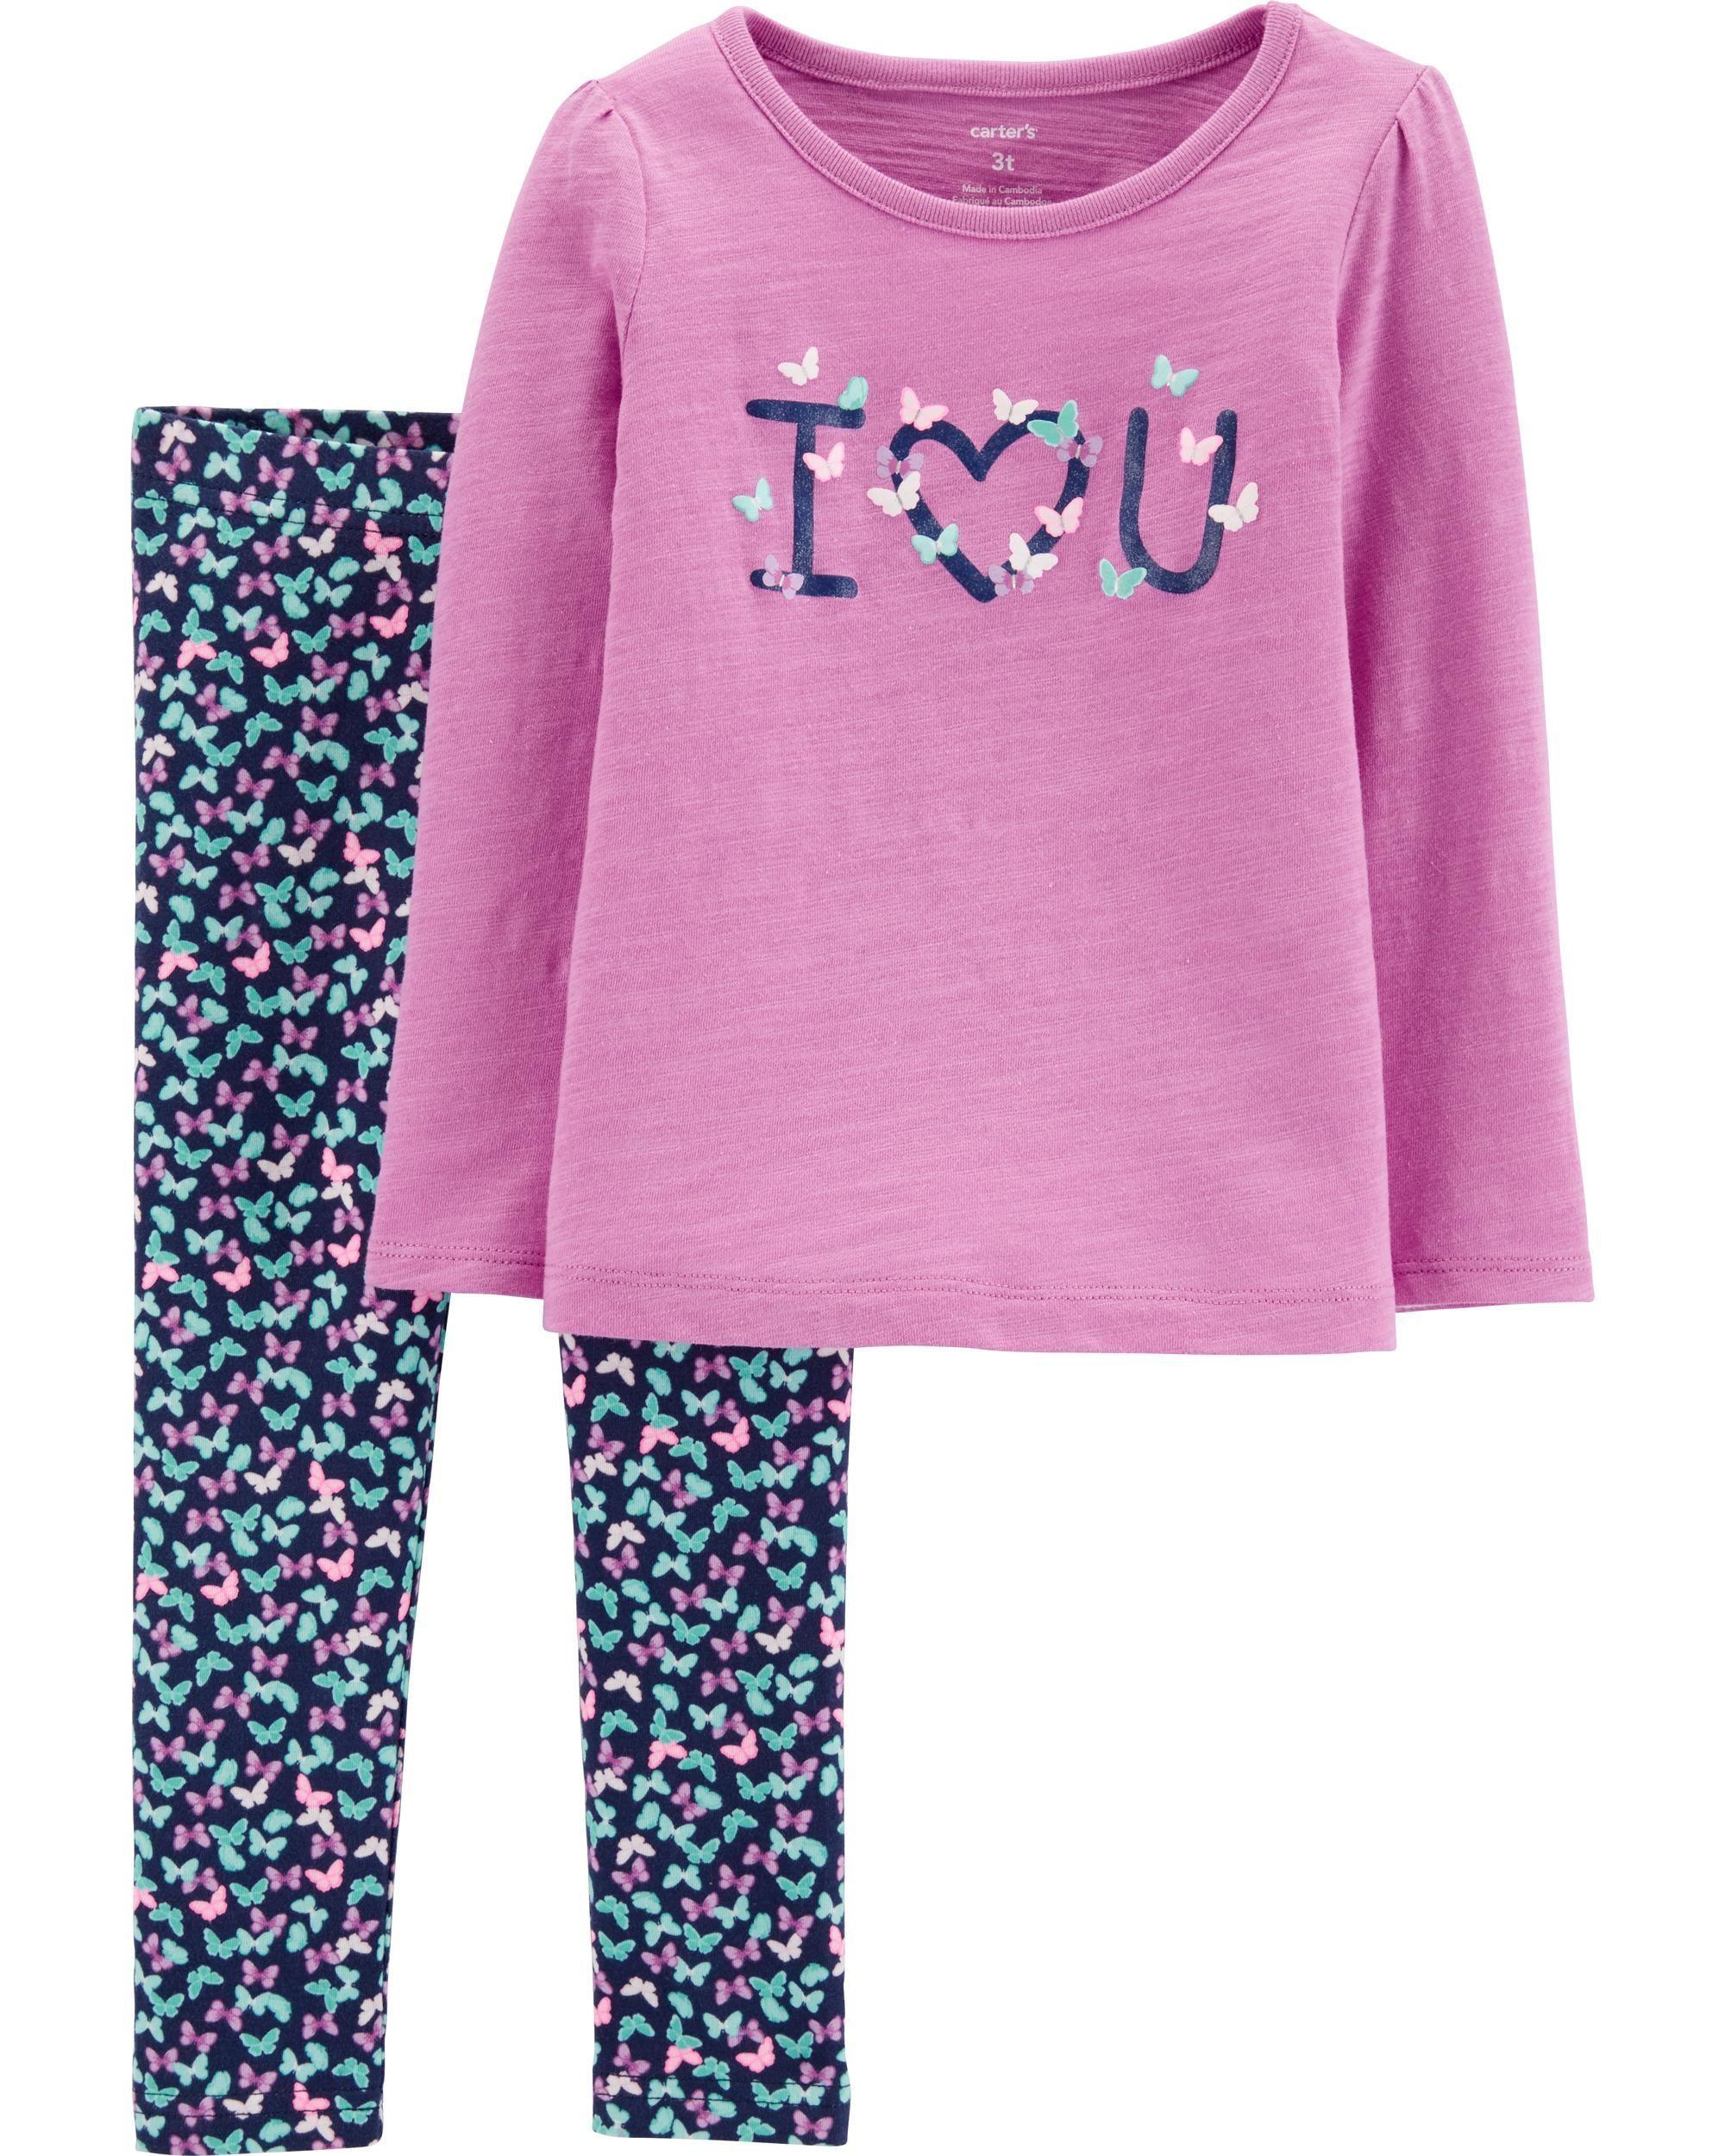 b487bbe57593a Baby Girl 2-Piece I Love You Slub Top & Floral Legging Set | Carters.com